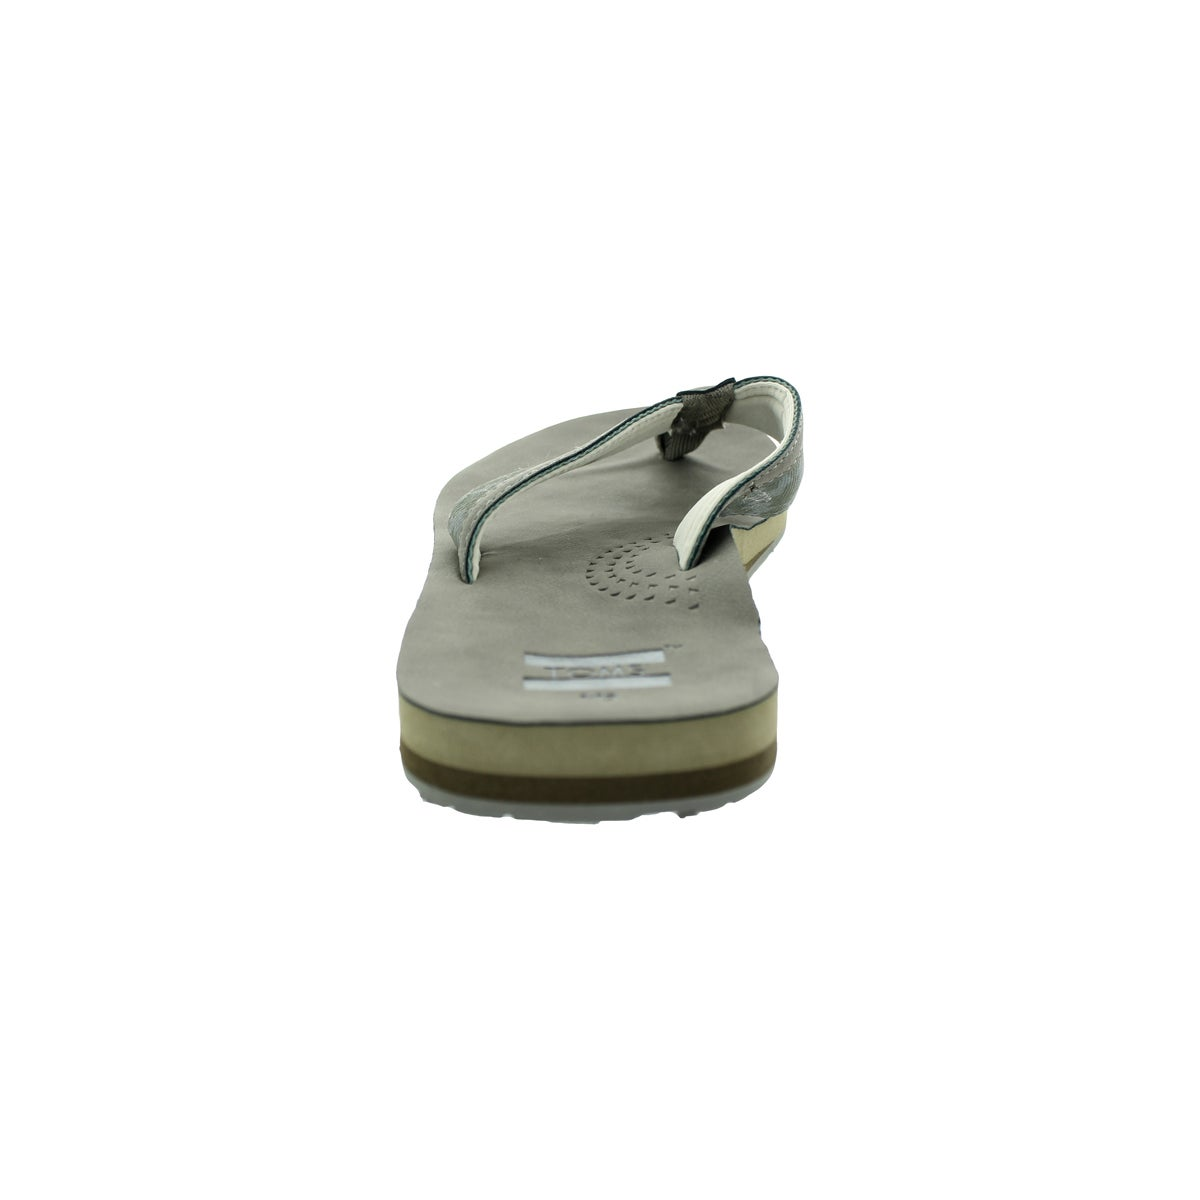 78d0cd00470b Shop Toms Men s Verano Flip Flop Ash Olive Sandal - Free Shipping On Orders  Over  45 - Overstock - 12328486